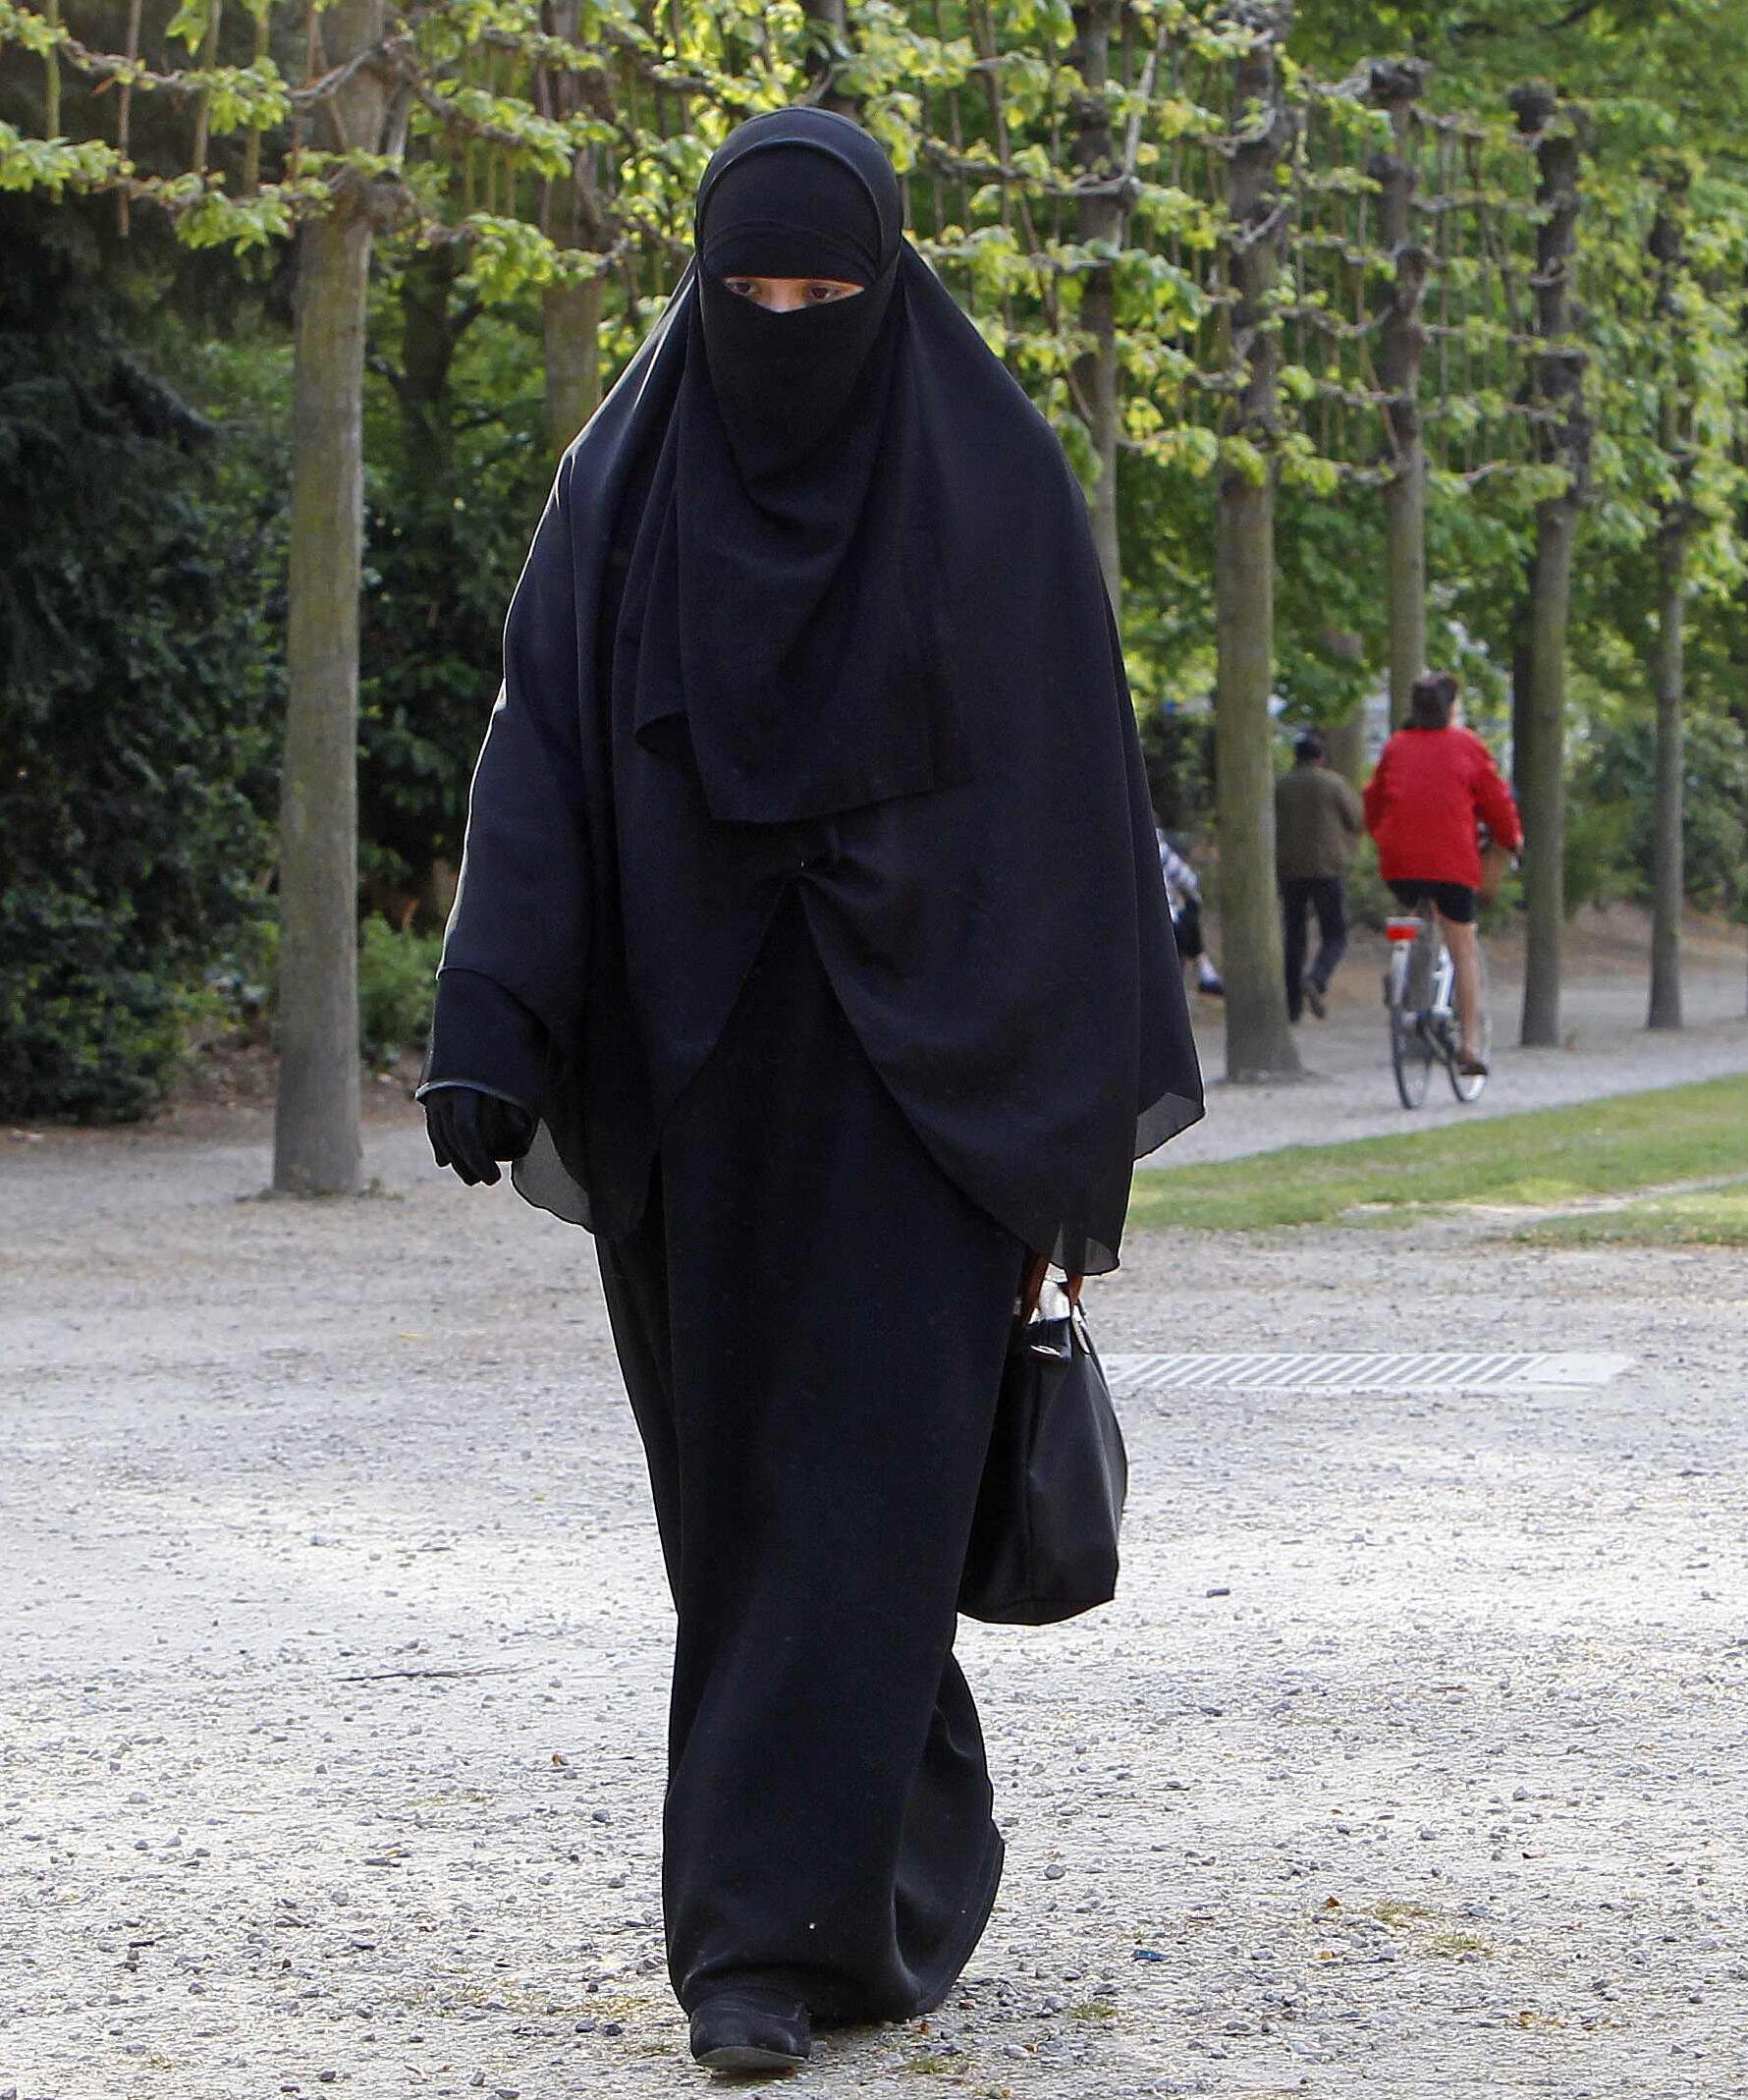 A French Islamic convert, Salma, defies the burka ban